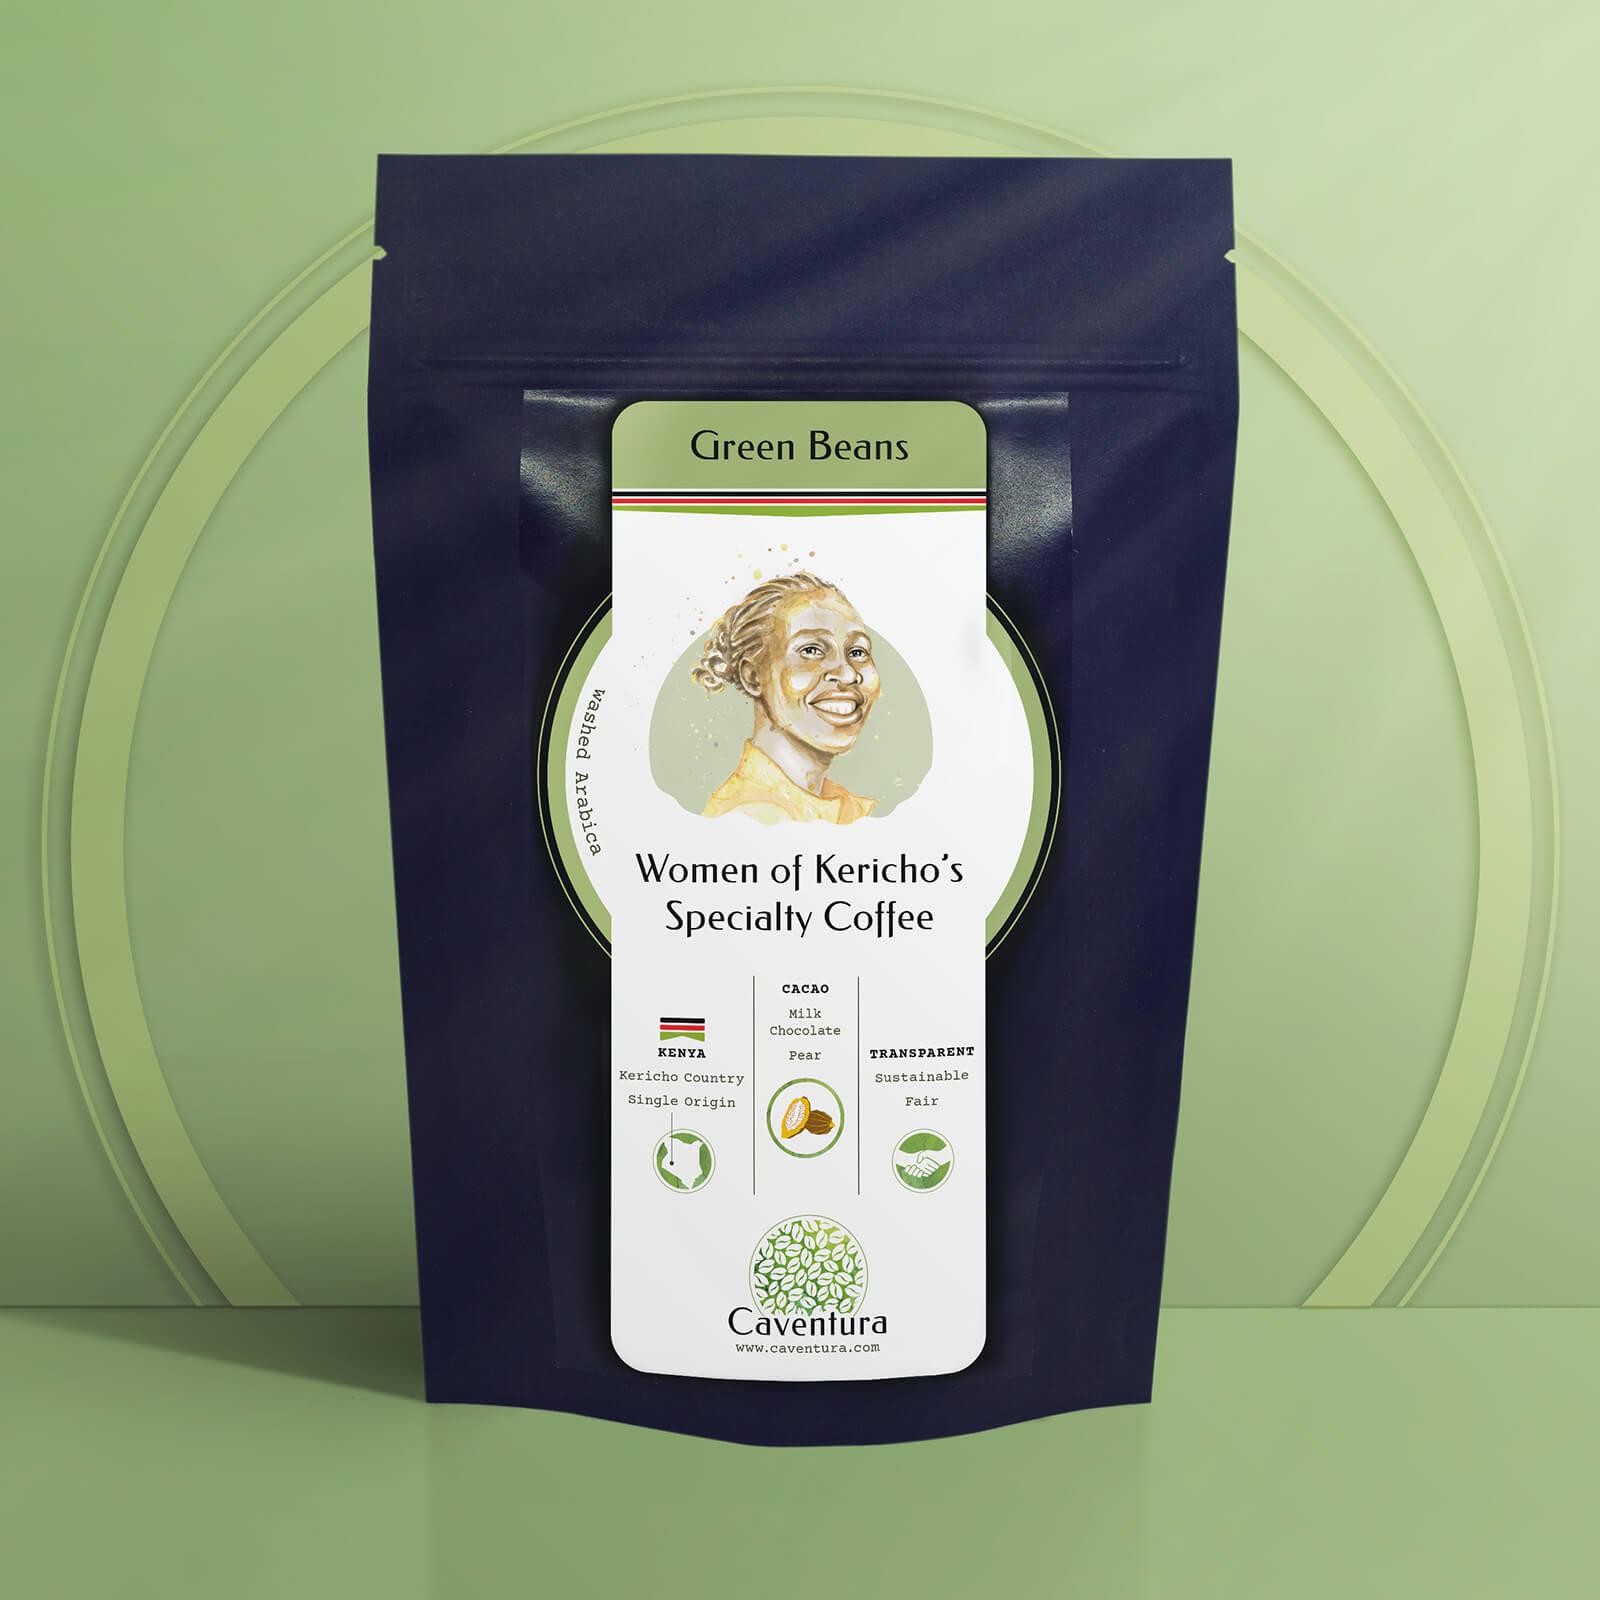 Women of Kericho's Specialty Coffee – Green Beans